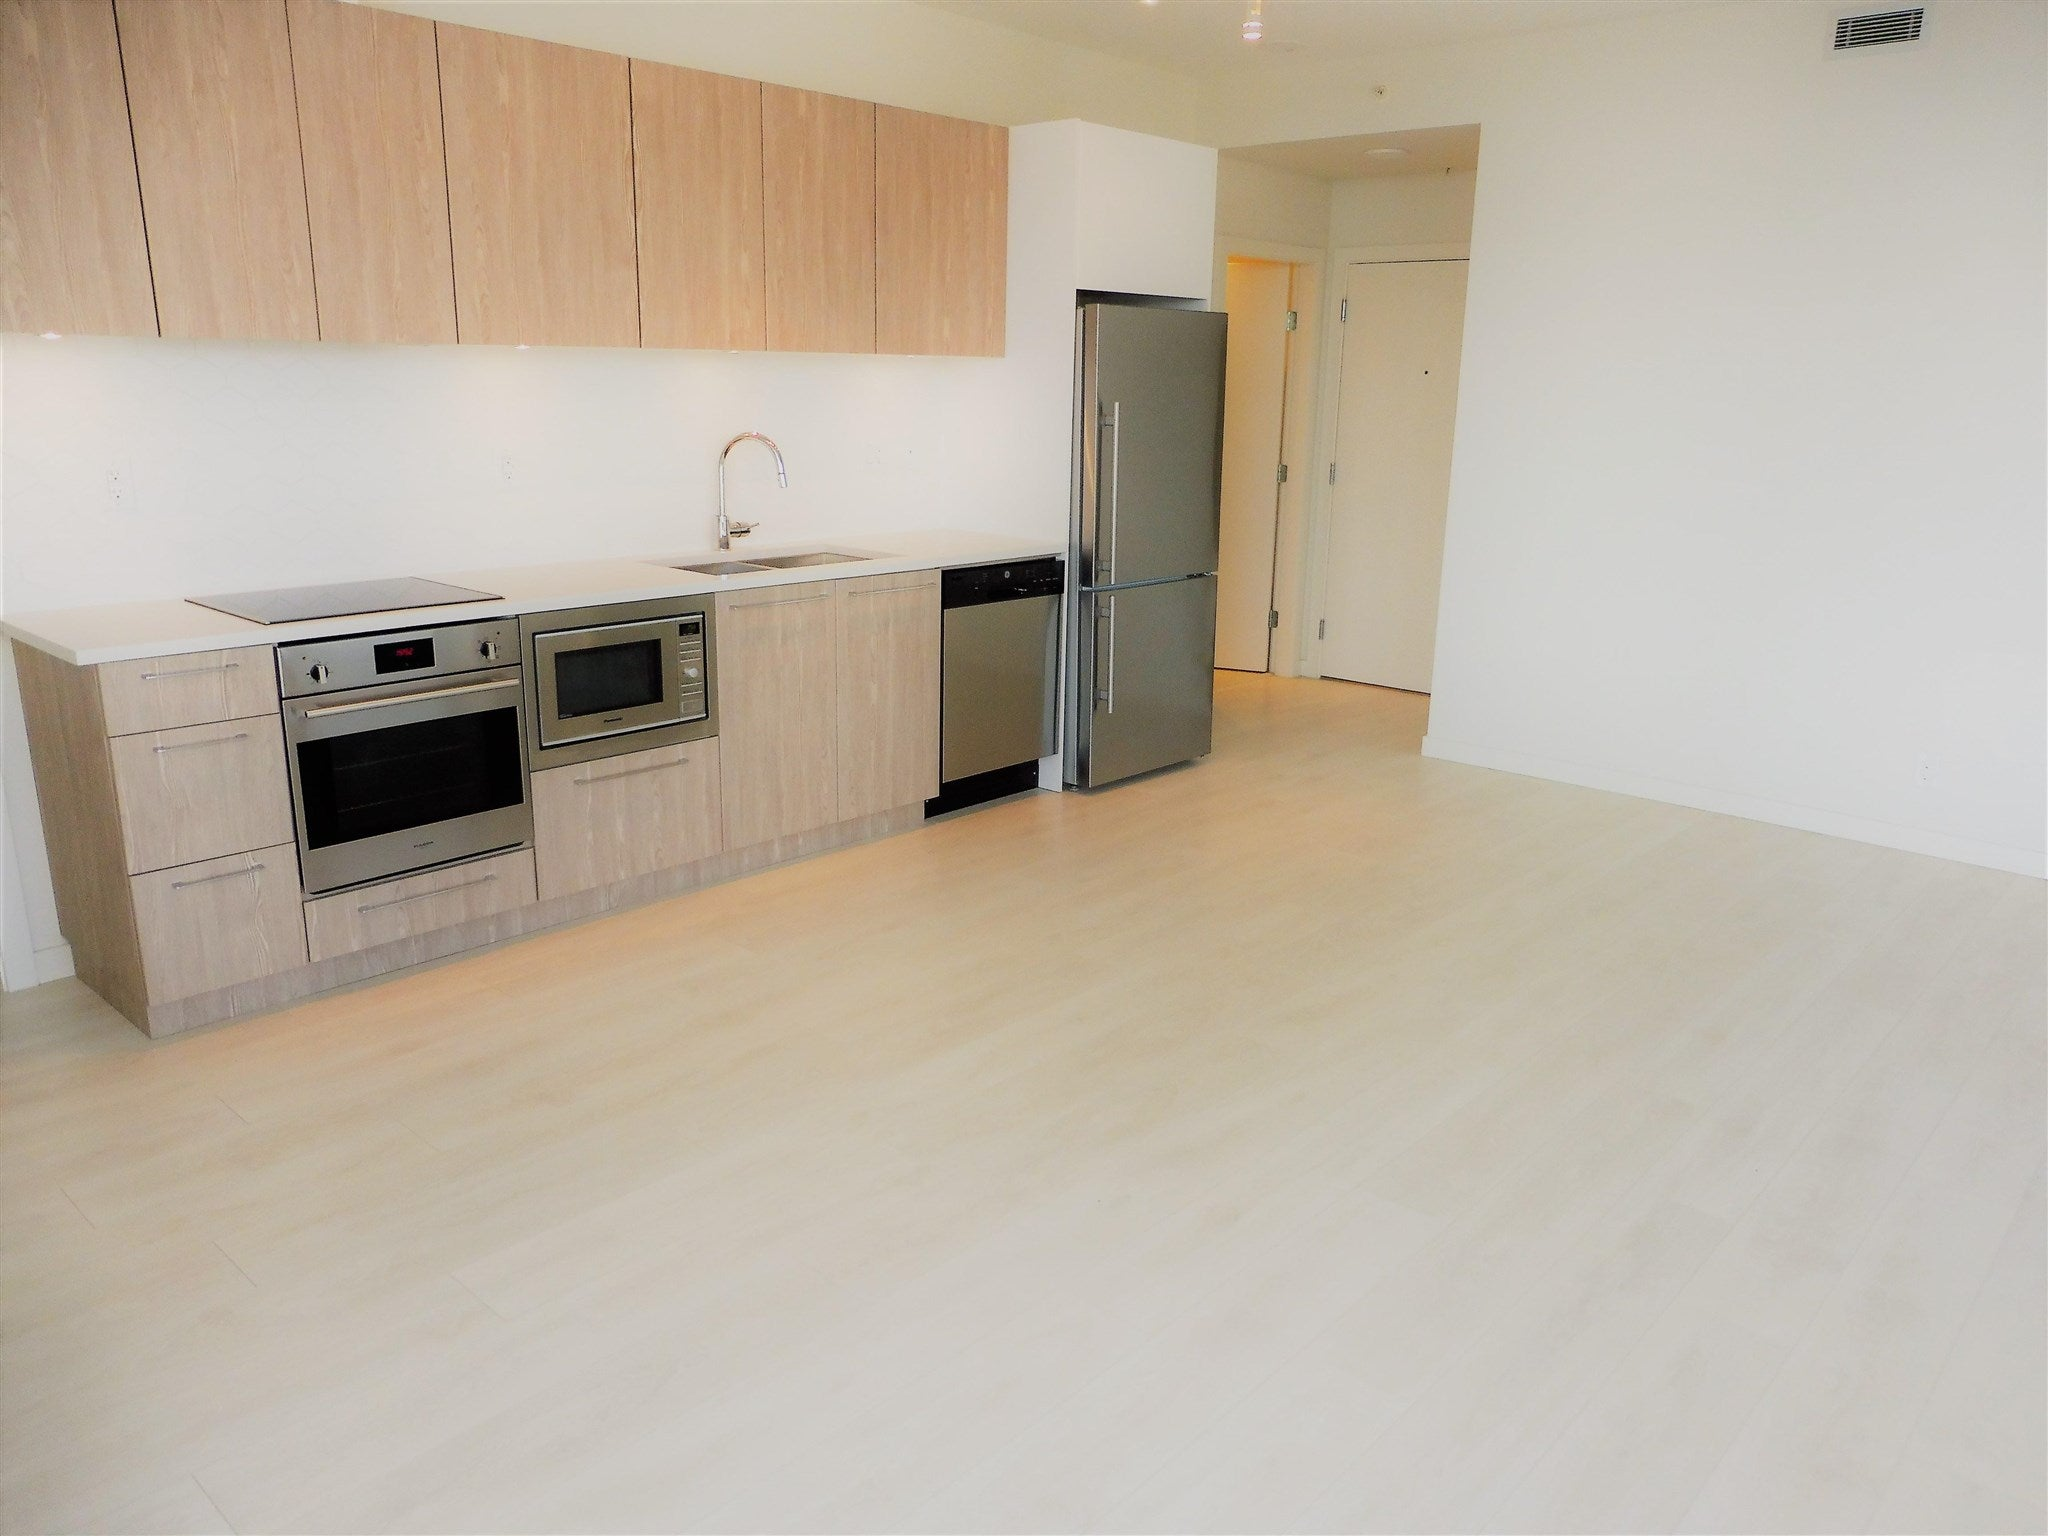 1409 691 NORTH ROAD - Coquitlam West Apartment/Condo for sale, 2 Bedrooms (R2604155) - #6